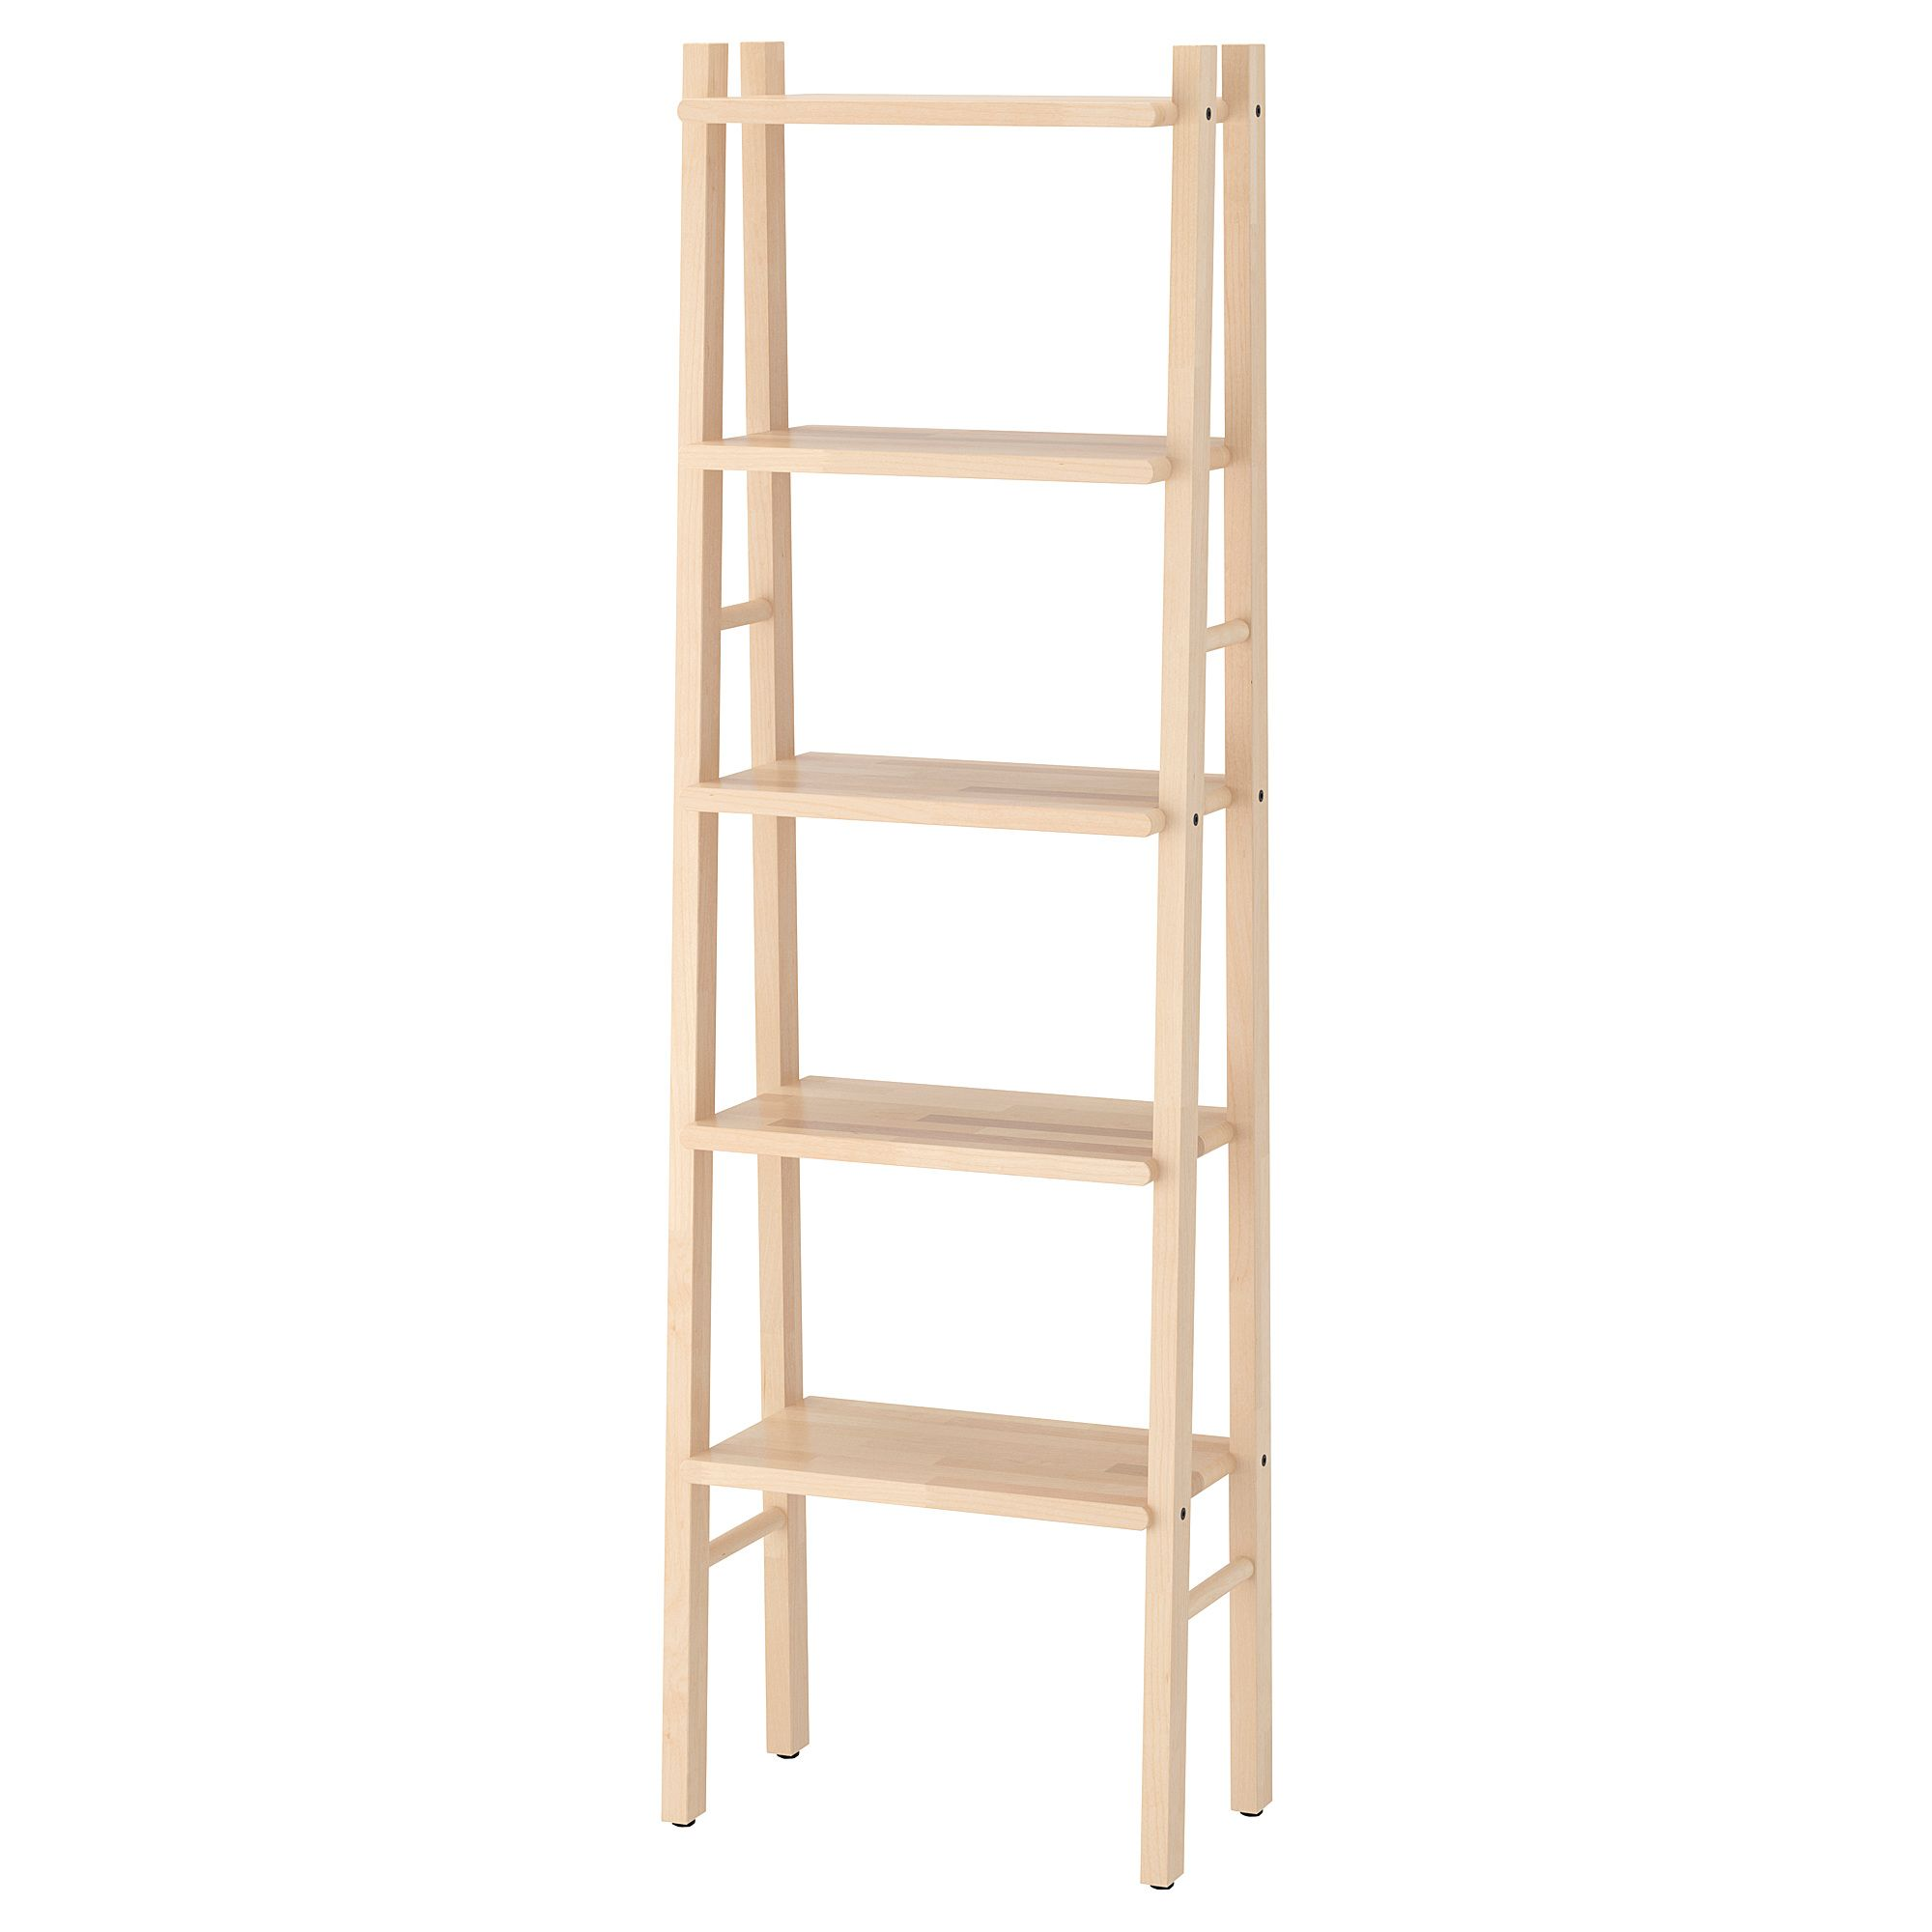 Vilto Regal Breza 46x150 Cm Ikea Shelf Unit Ikea Wall Shelf Unit